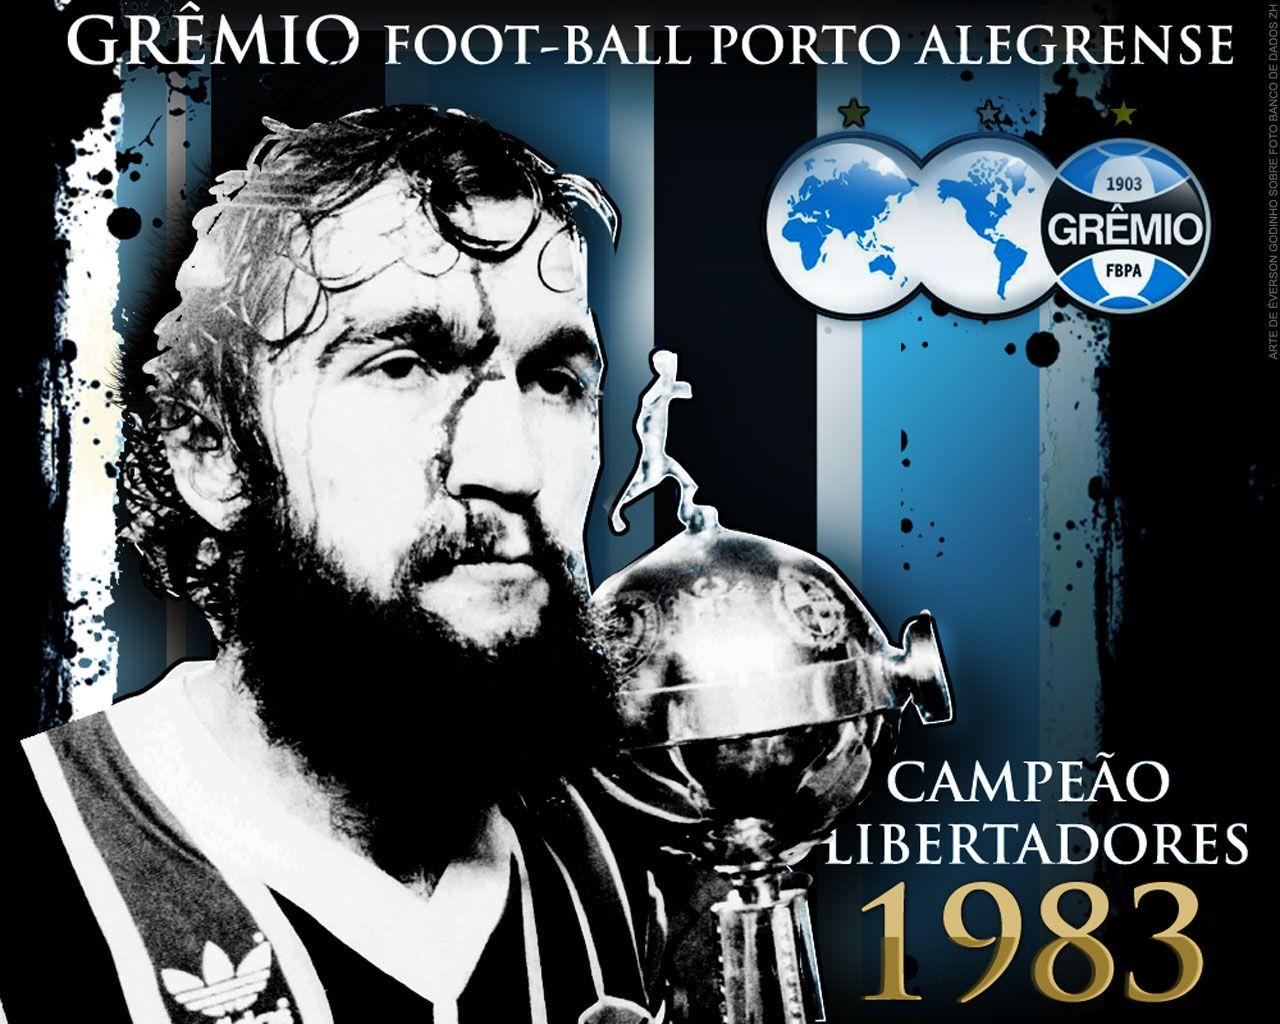 Bert Wallpaper Iphone X Papel De Parede Gr 234 Mio Campe 227 O Libertadores 1983 Wallpaper